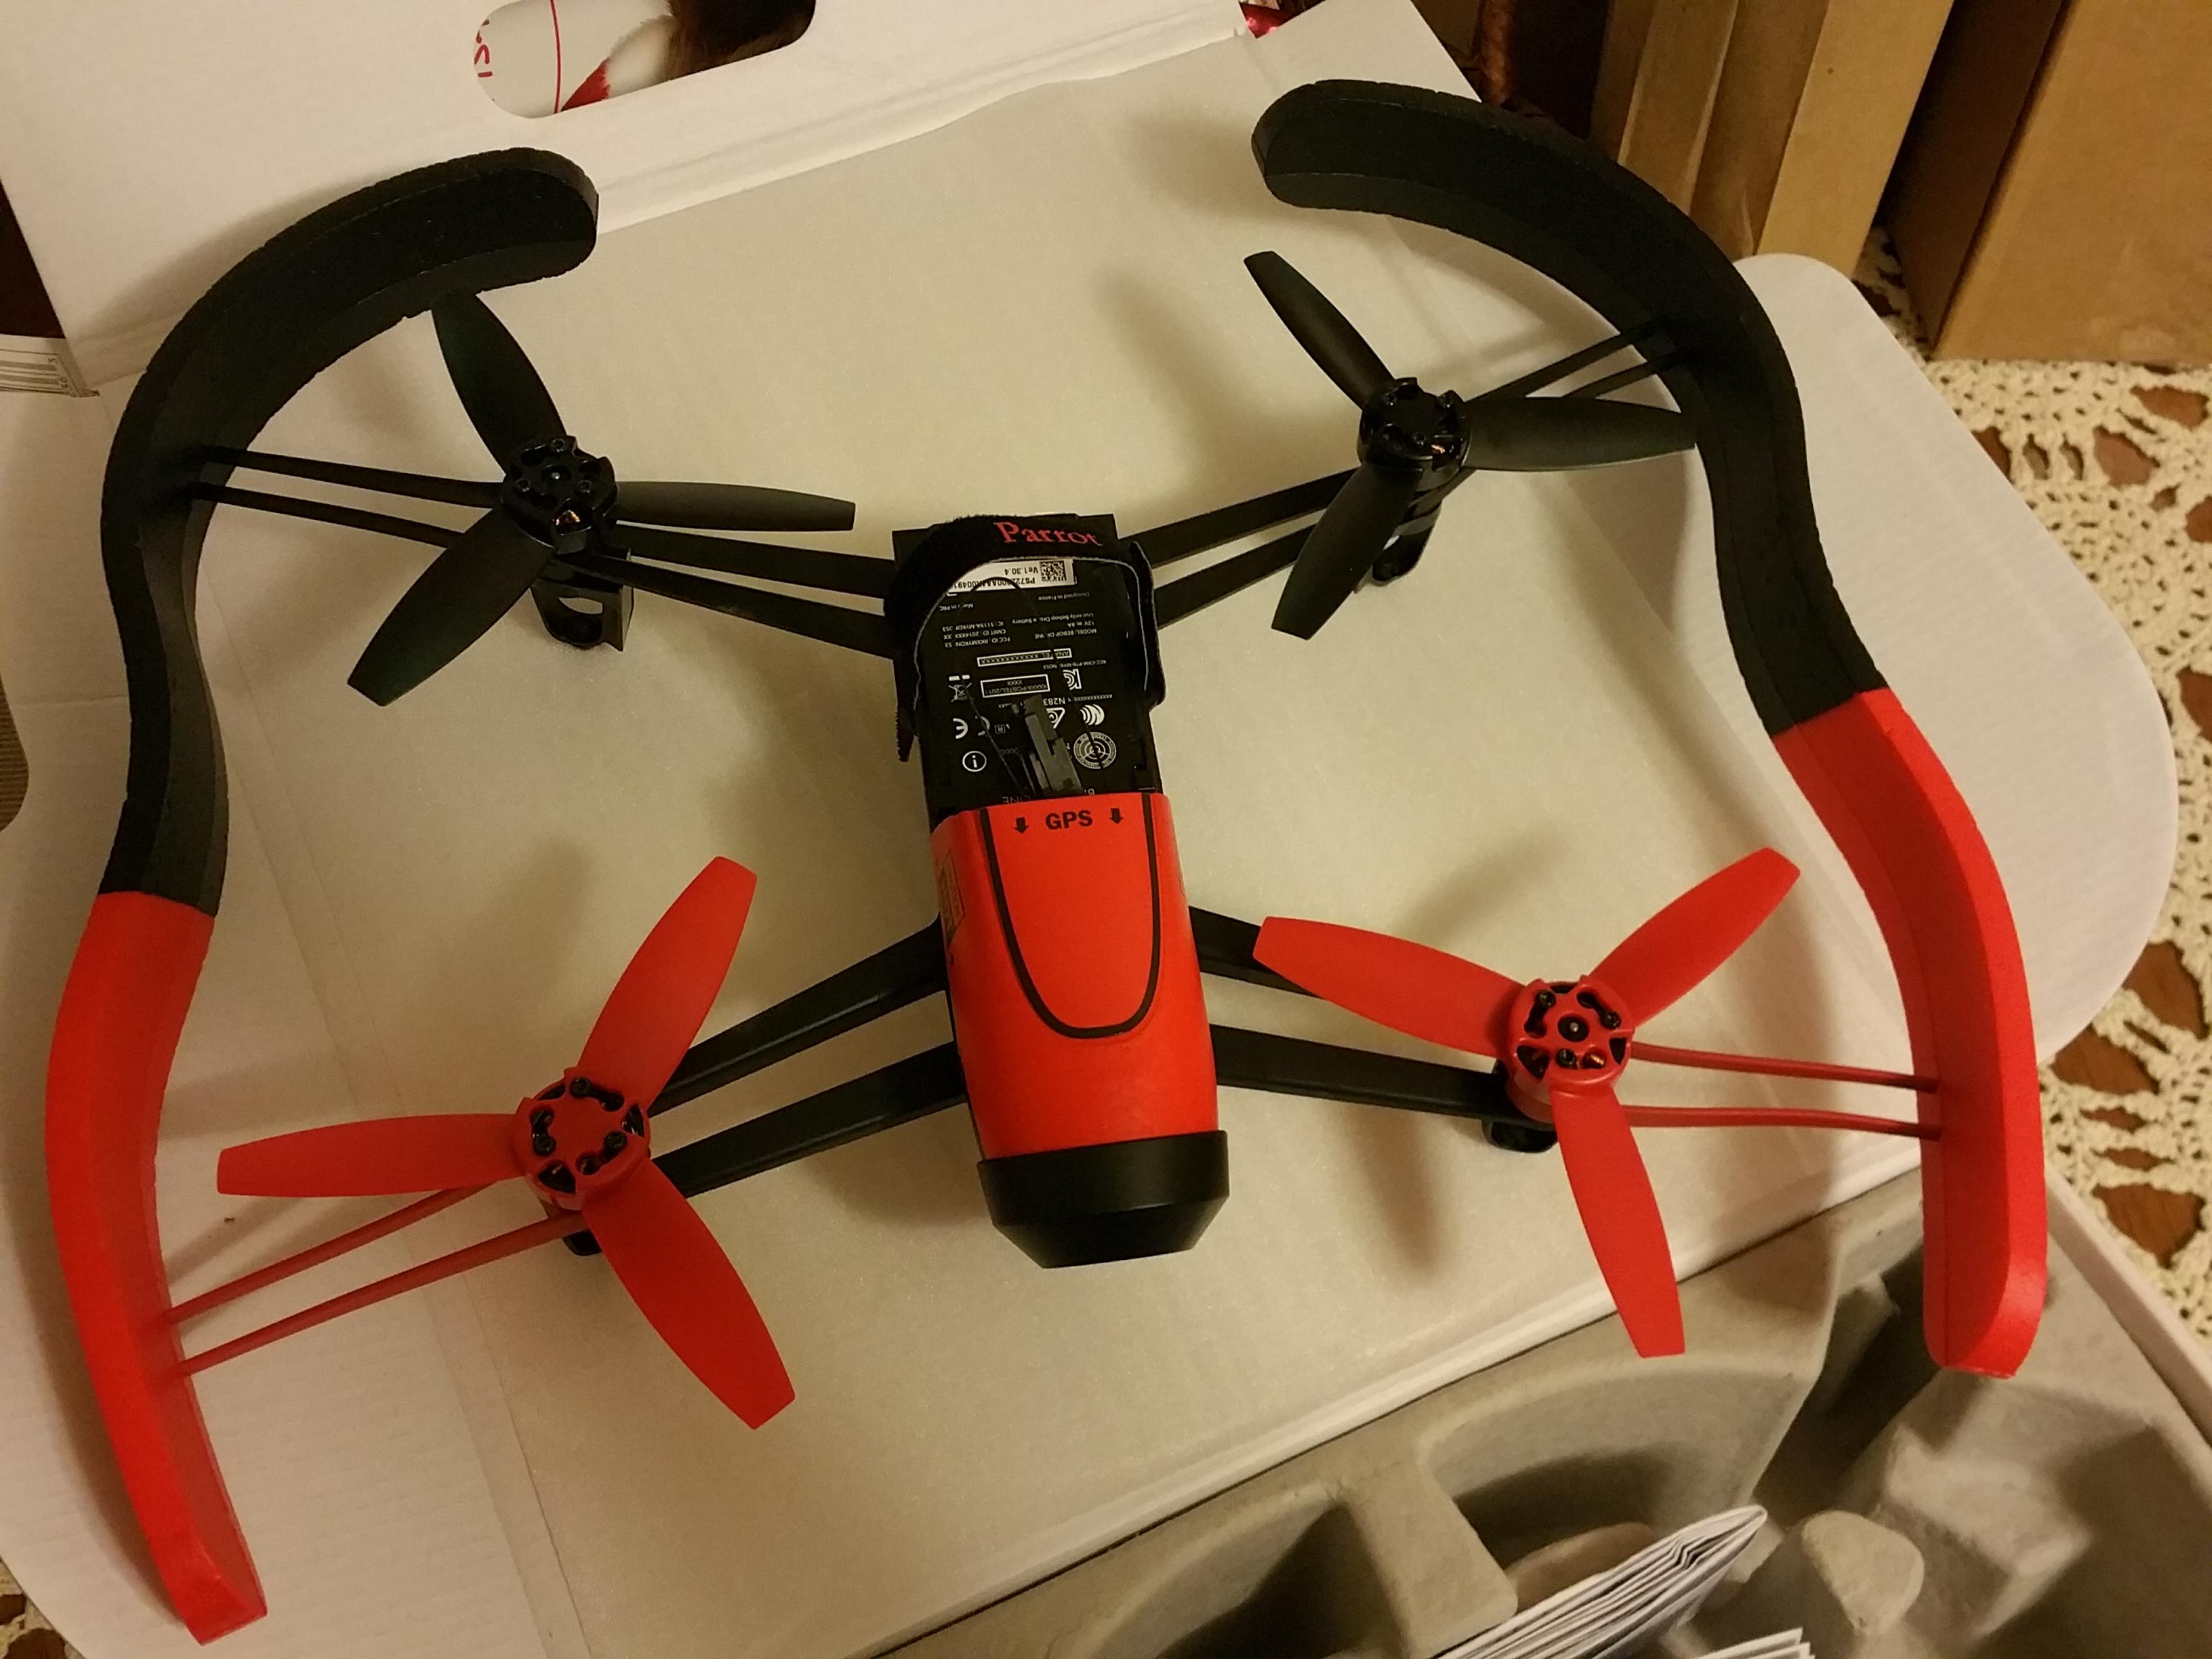 Parrot BeBop Quadcopter Review - Part 1 of 3 - Droneflyers com